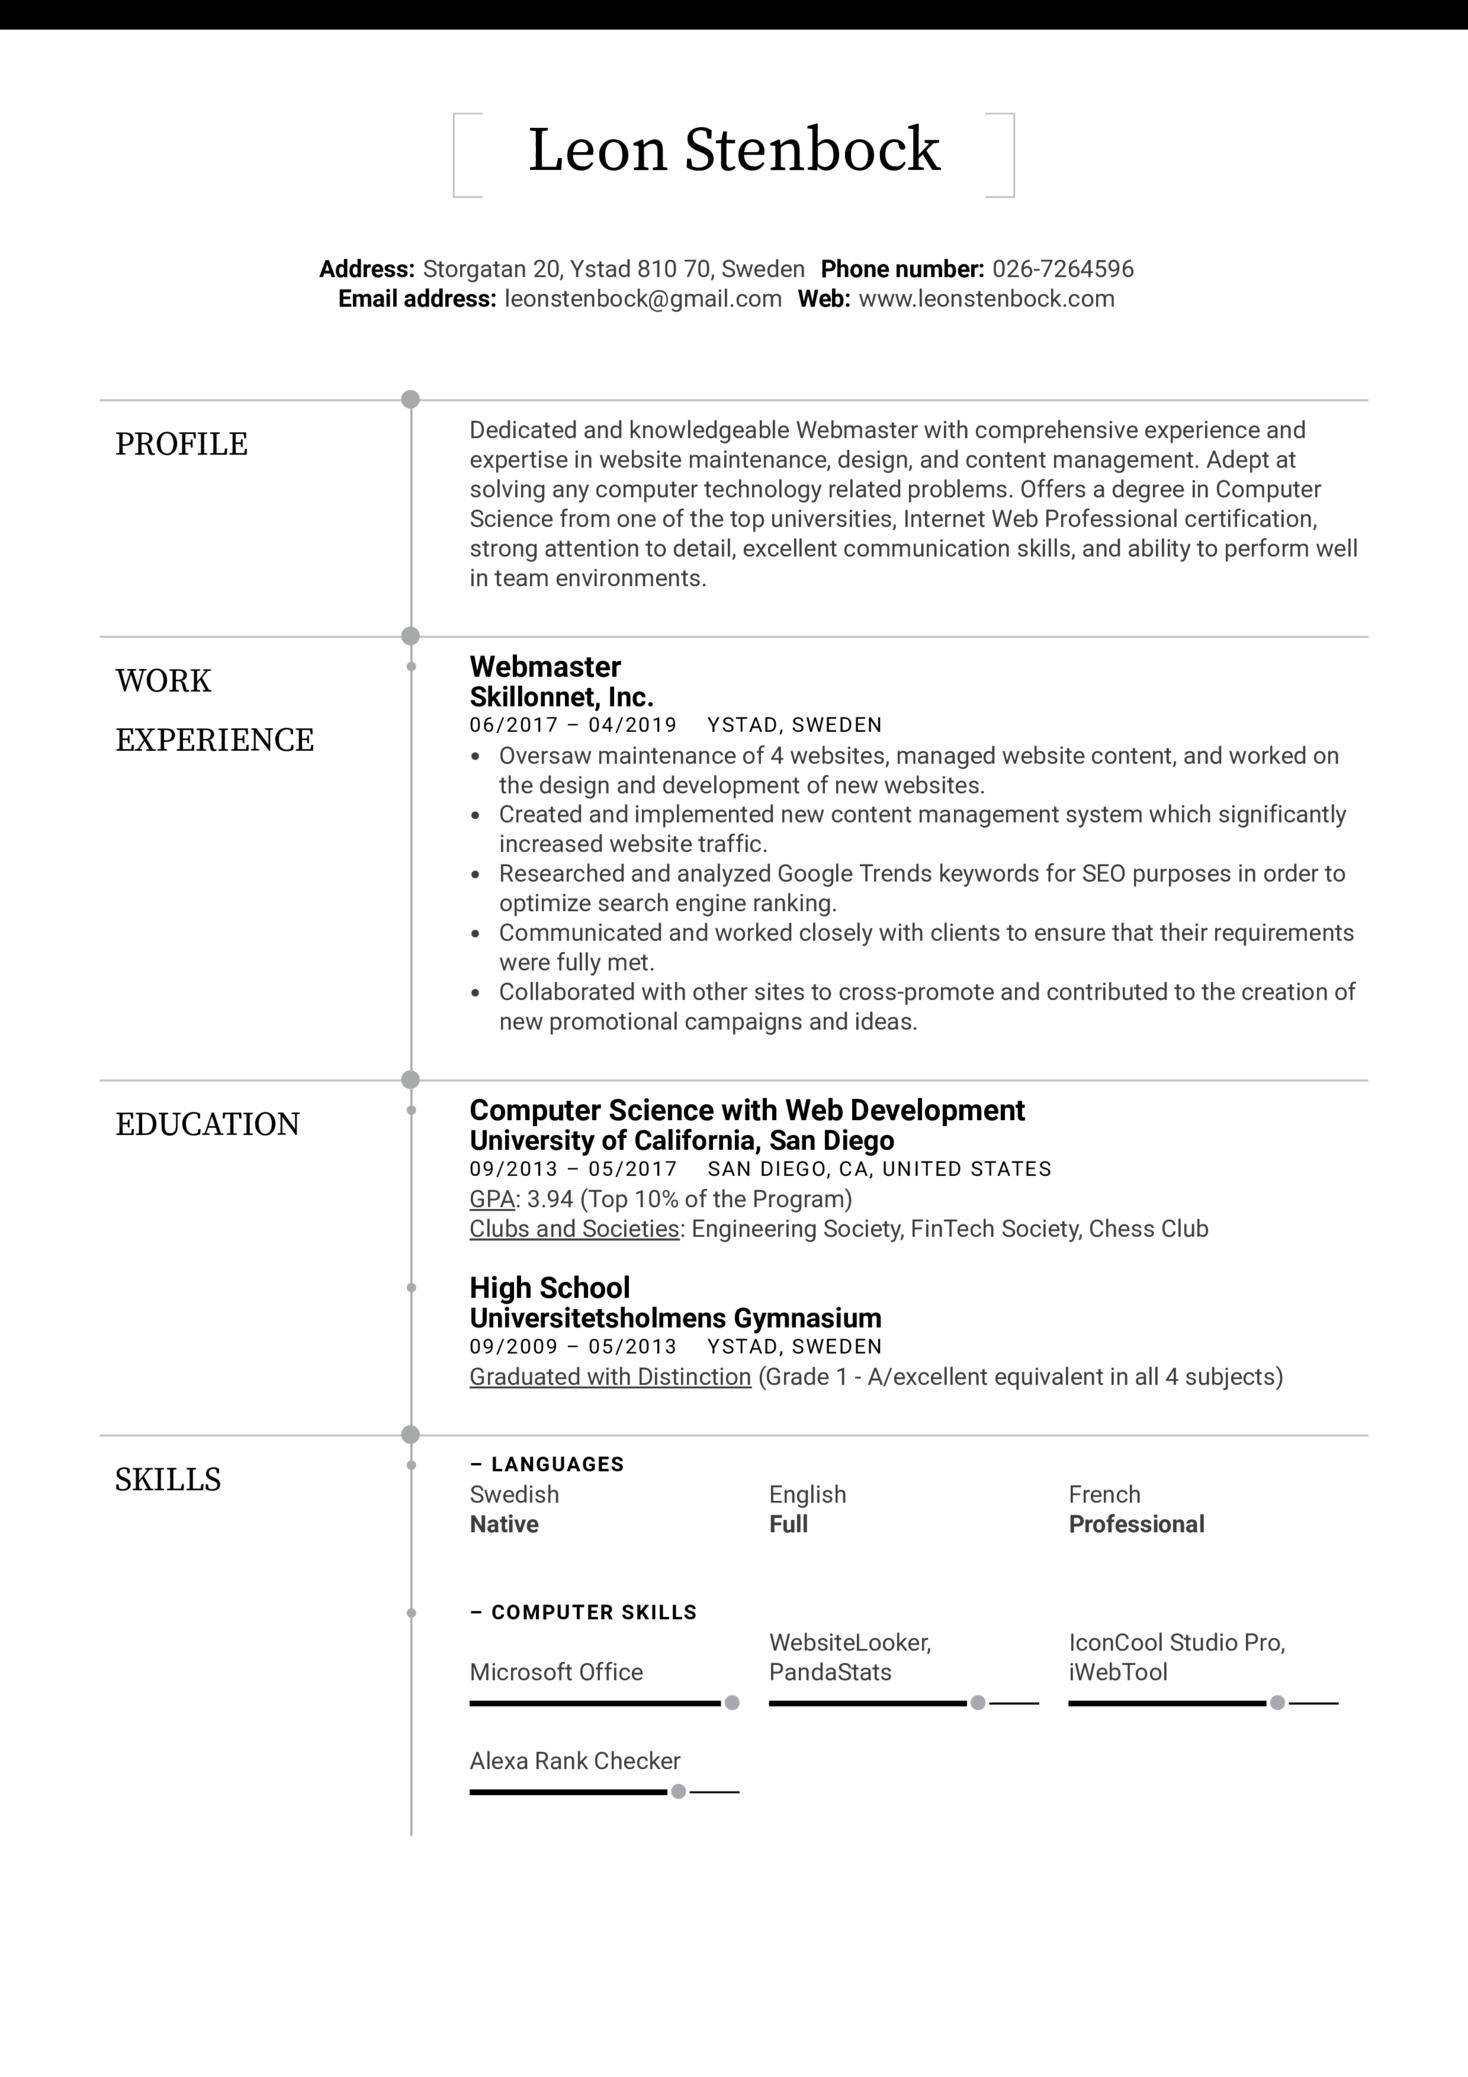 Webmaster Resume Example (Parte 1)